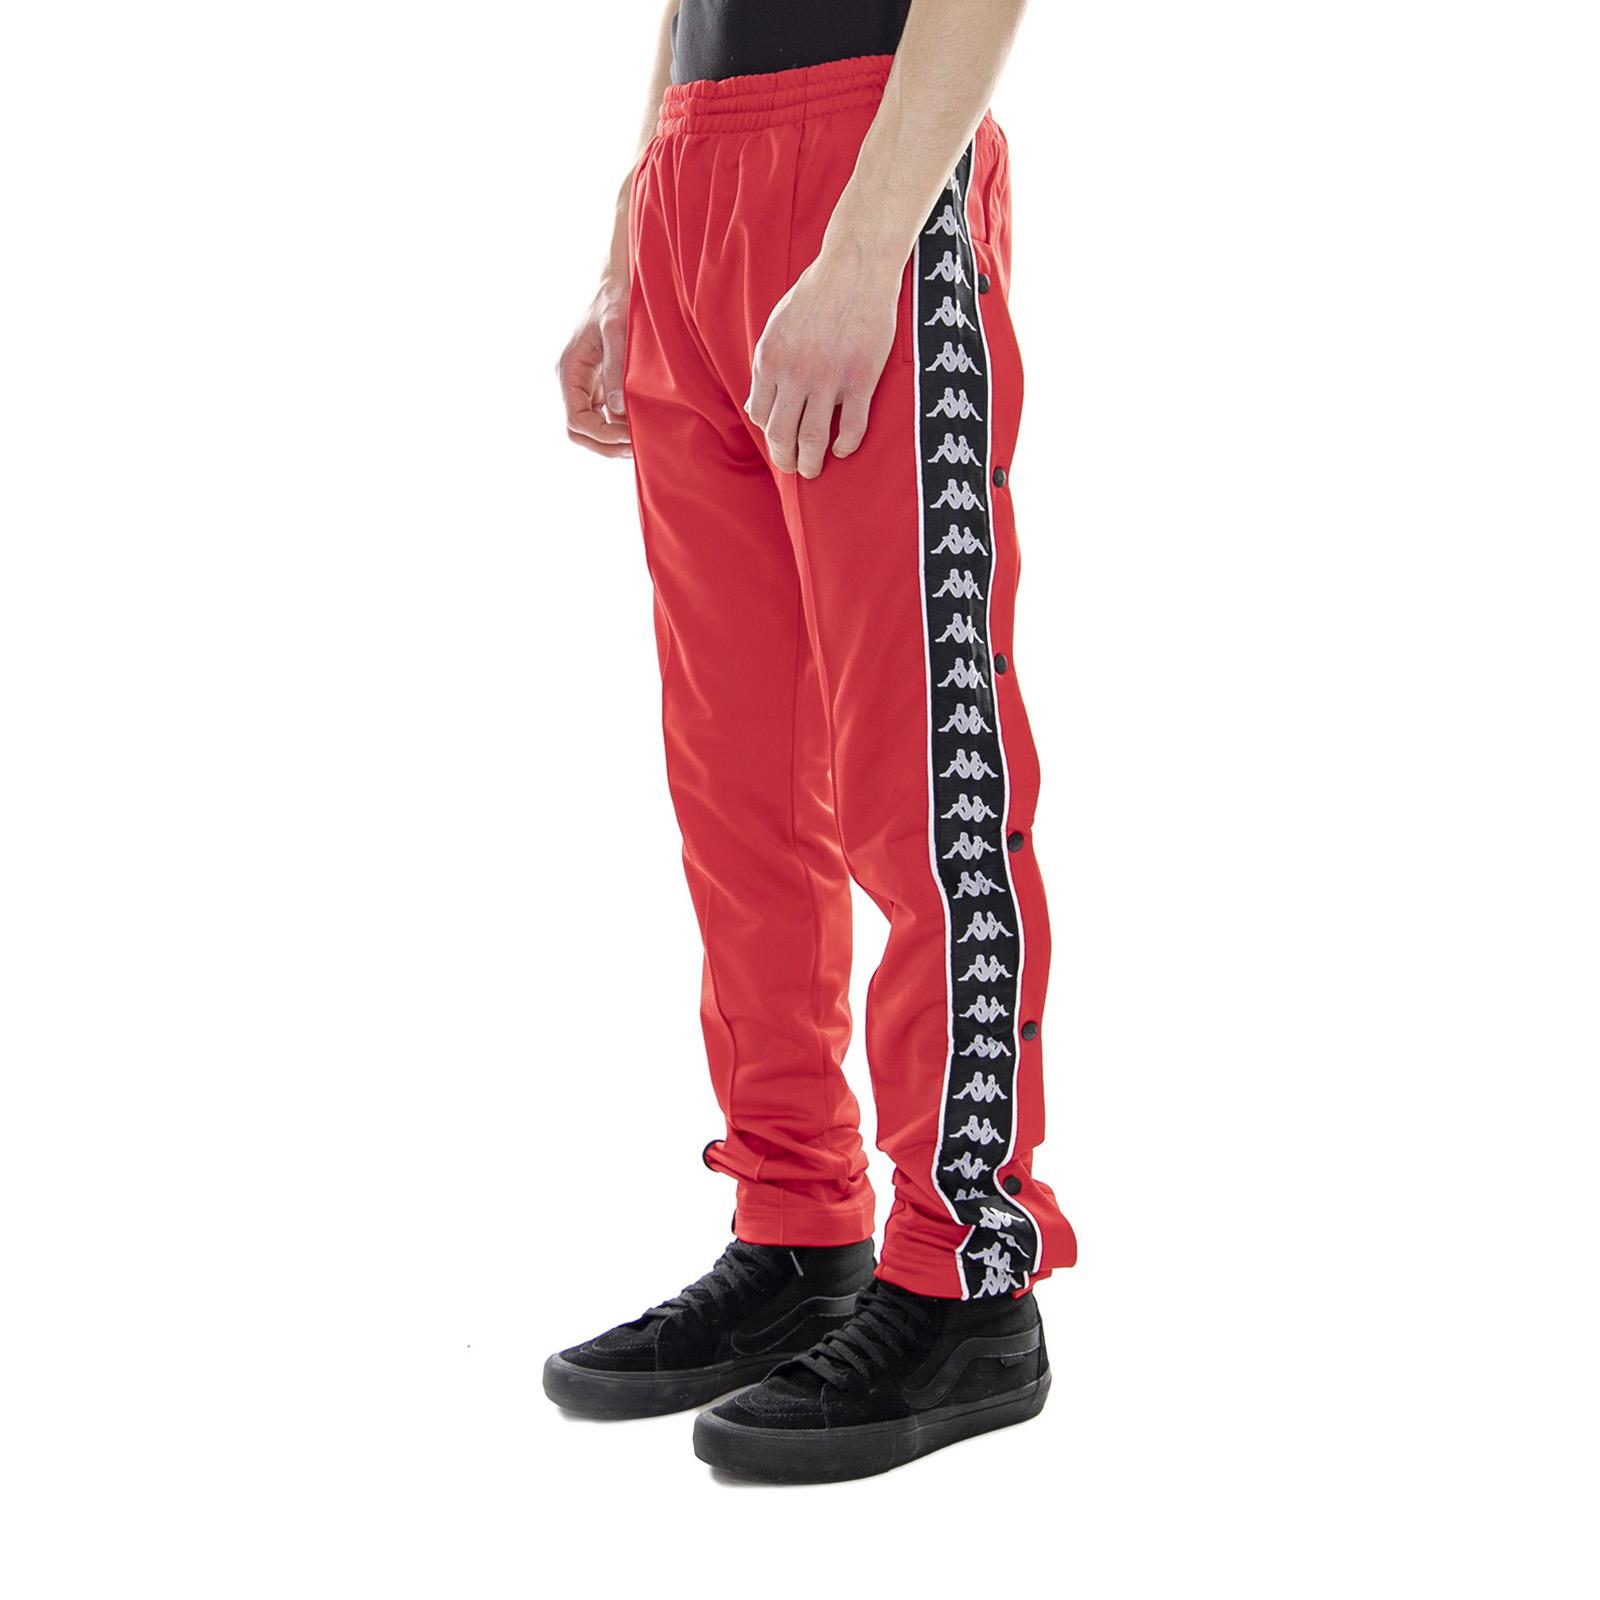 KAPPA 222 BANDA Astoria Snaps Slim RedBlackWhite Pantaloni Sportivi Uomo Rosso